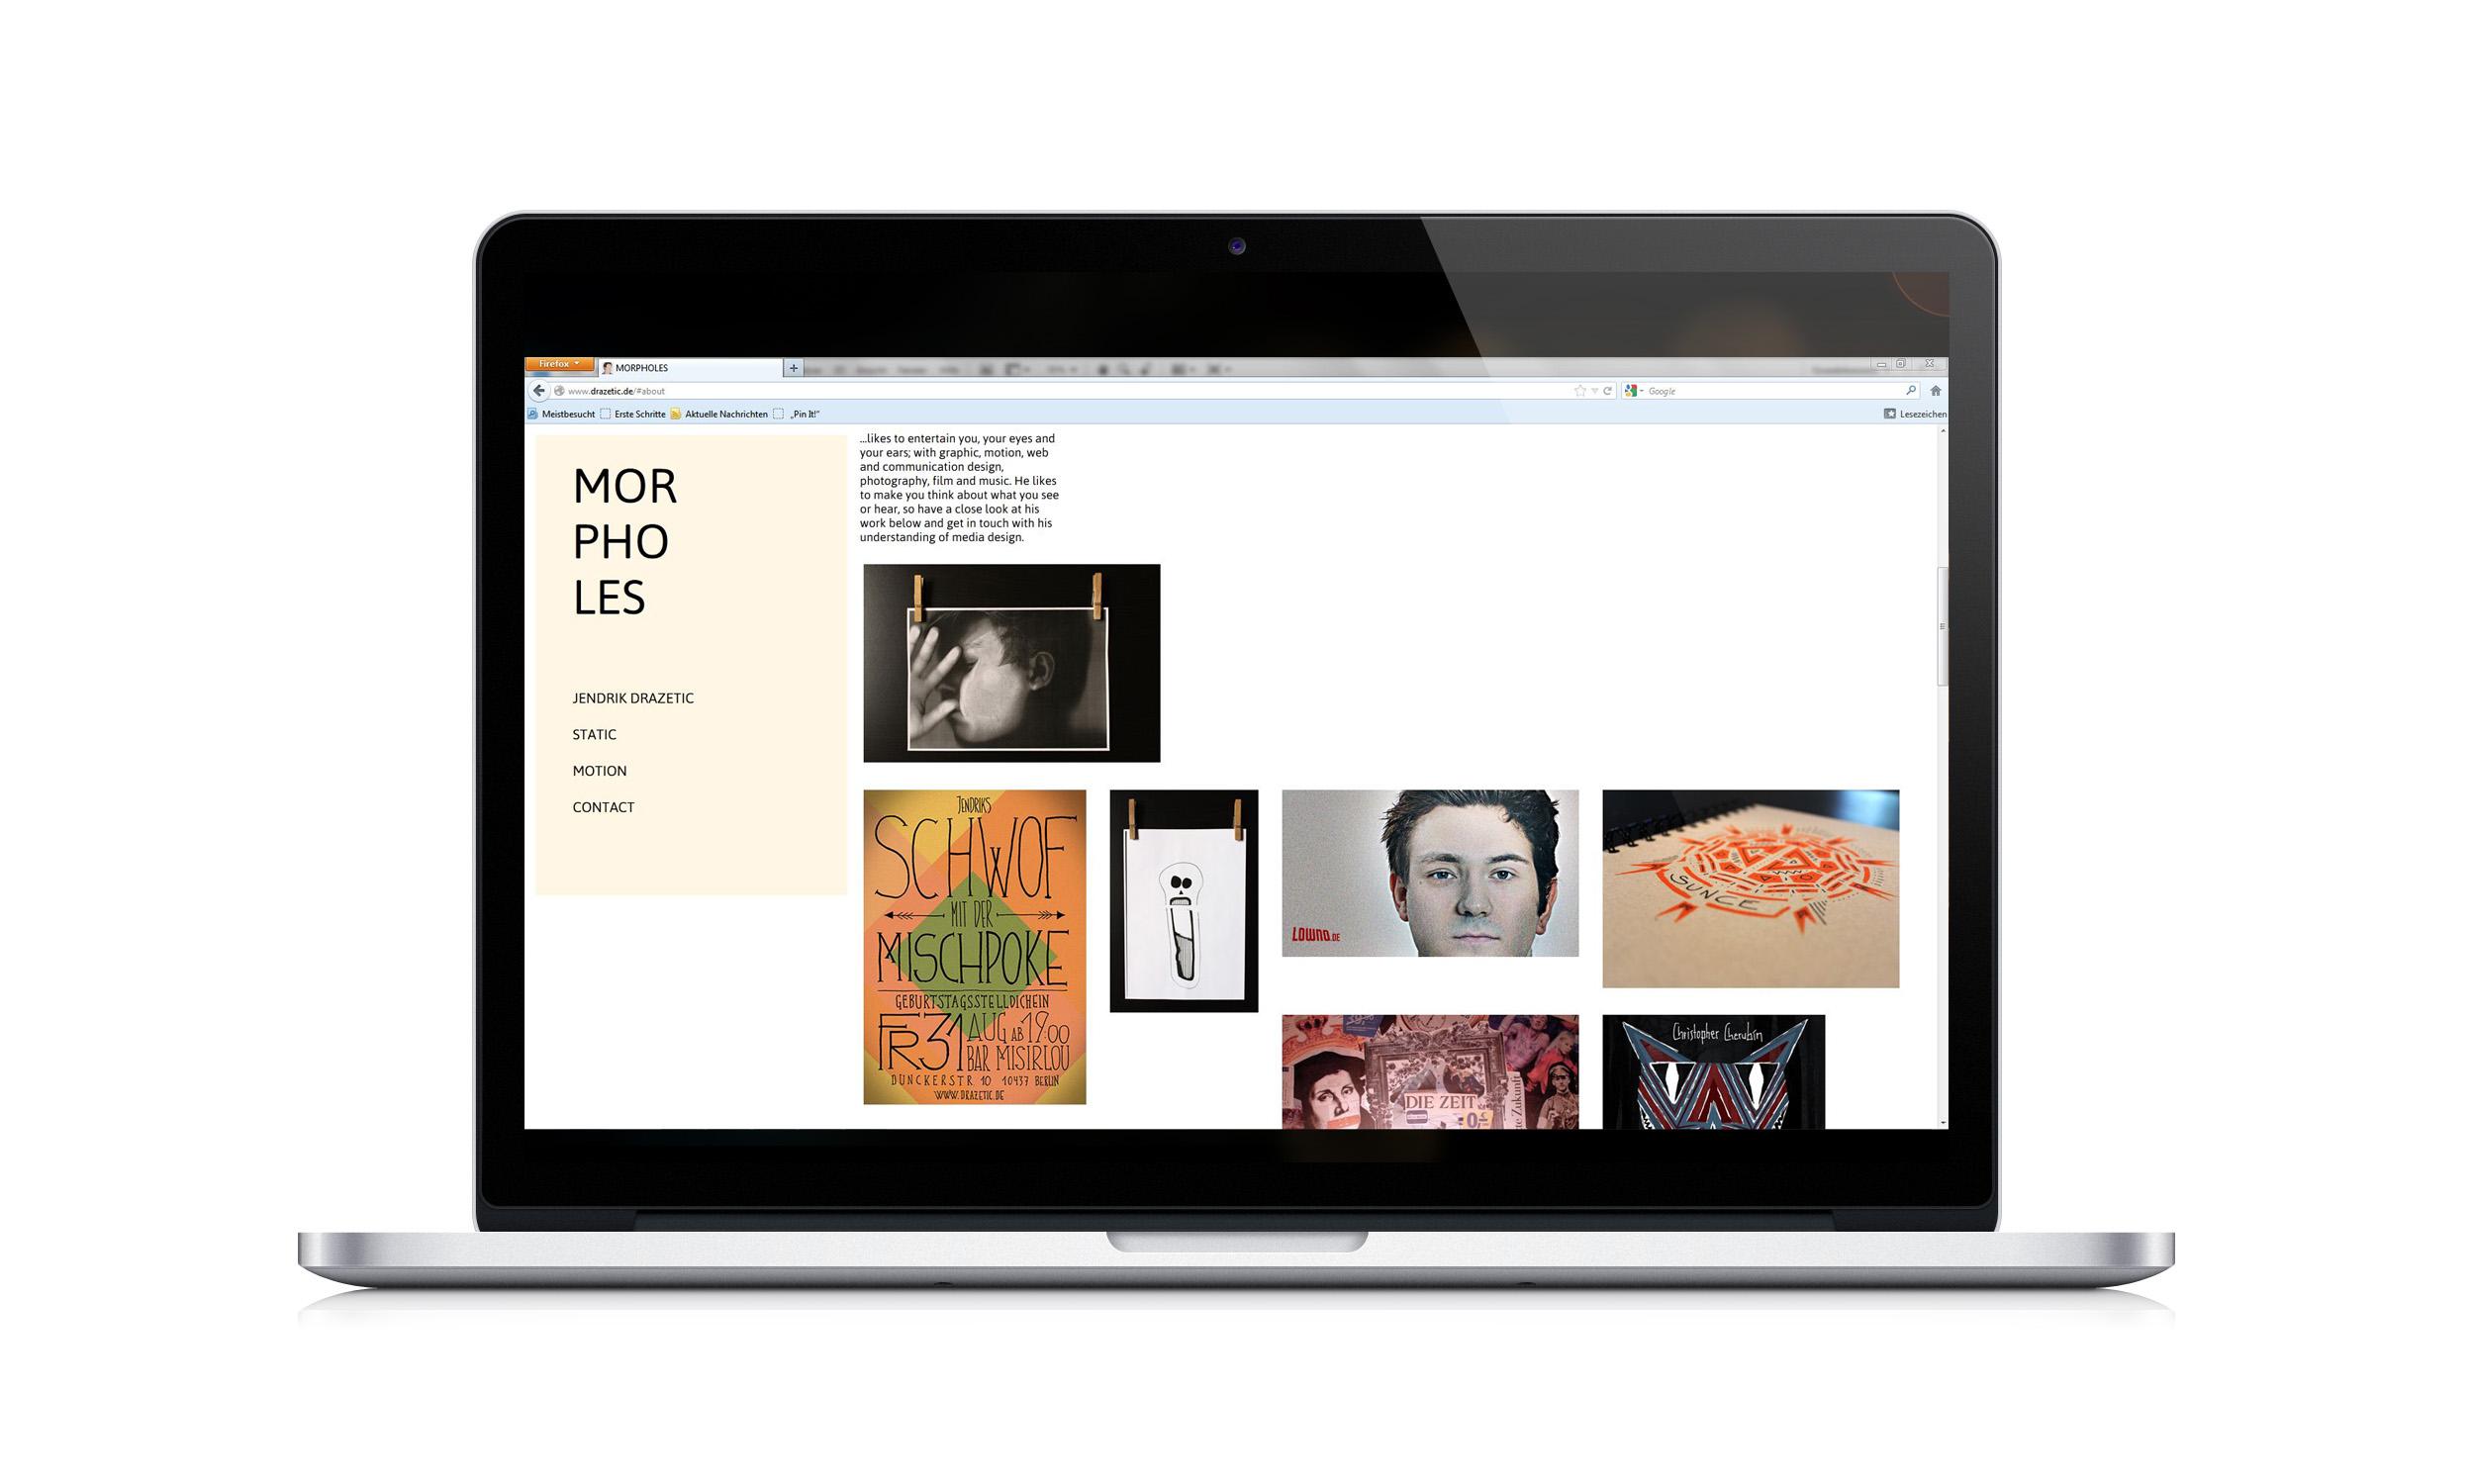 Morpholes Webseite